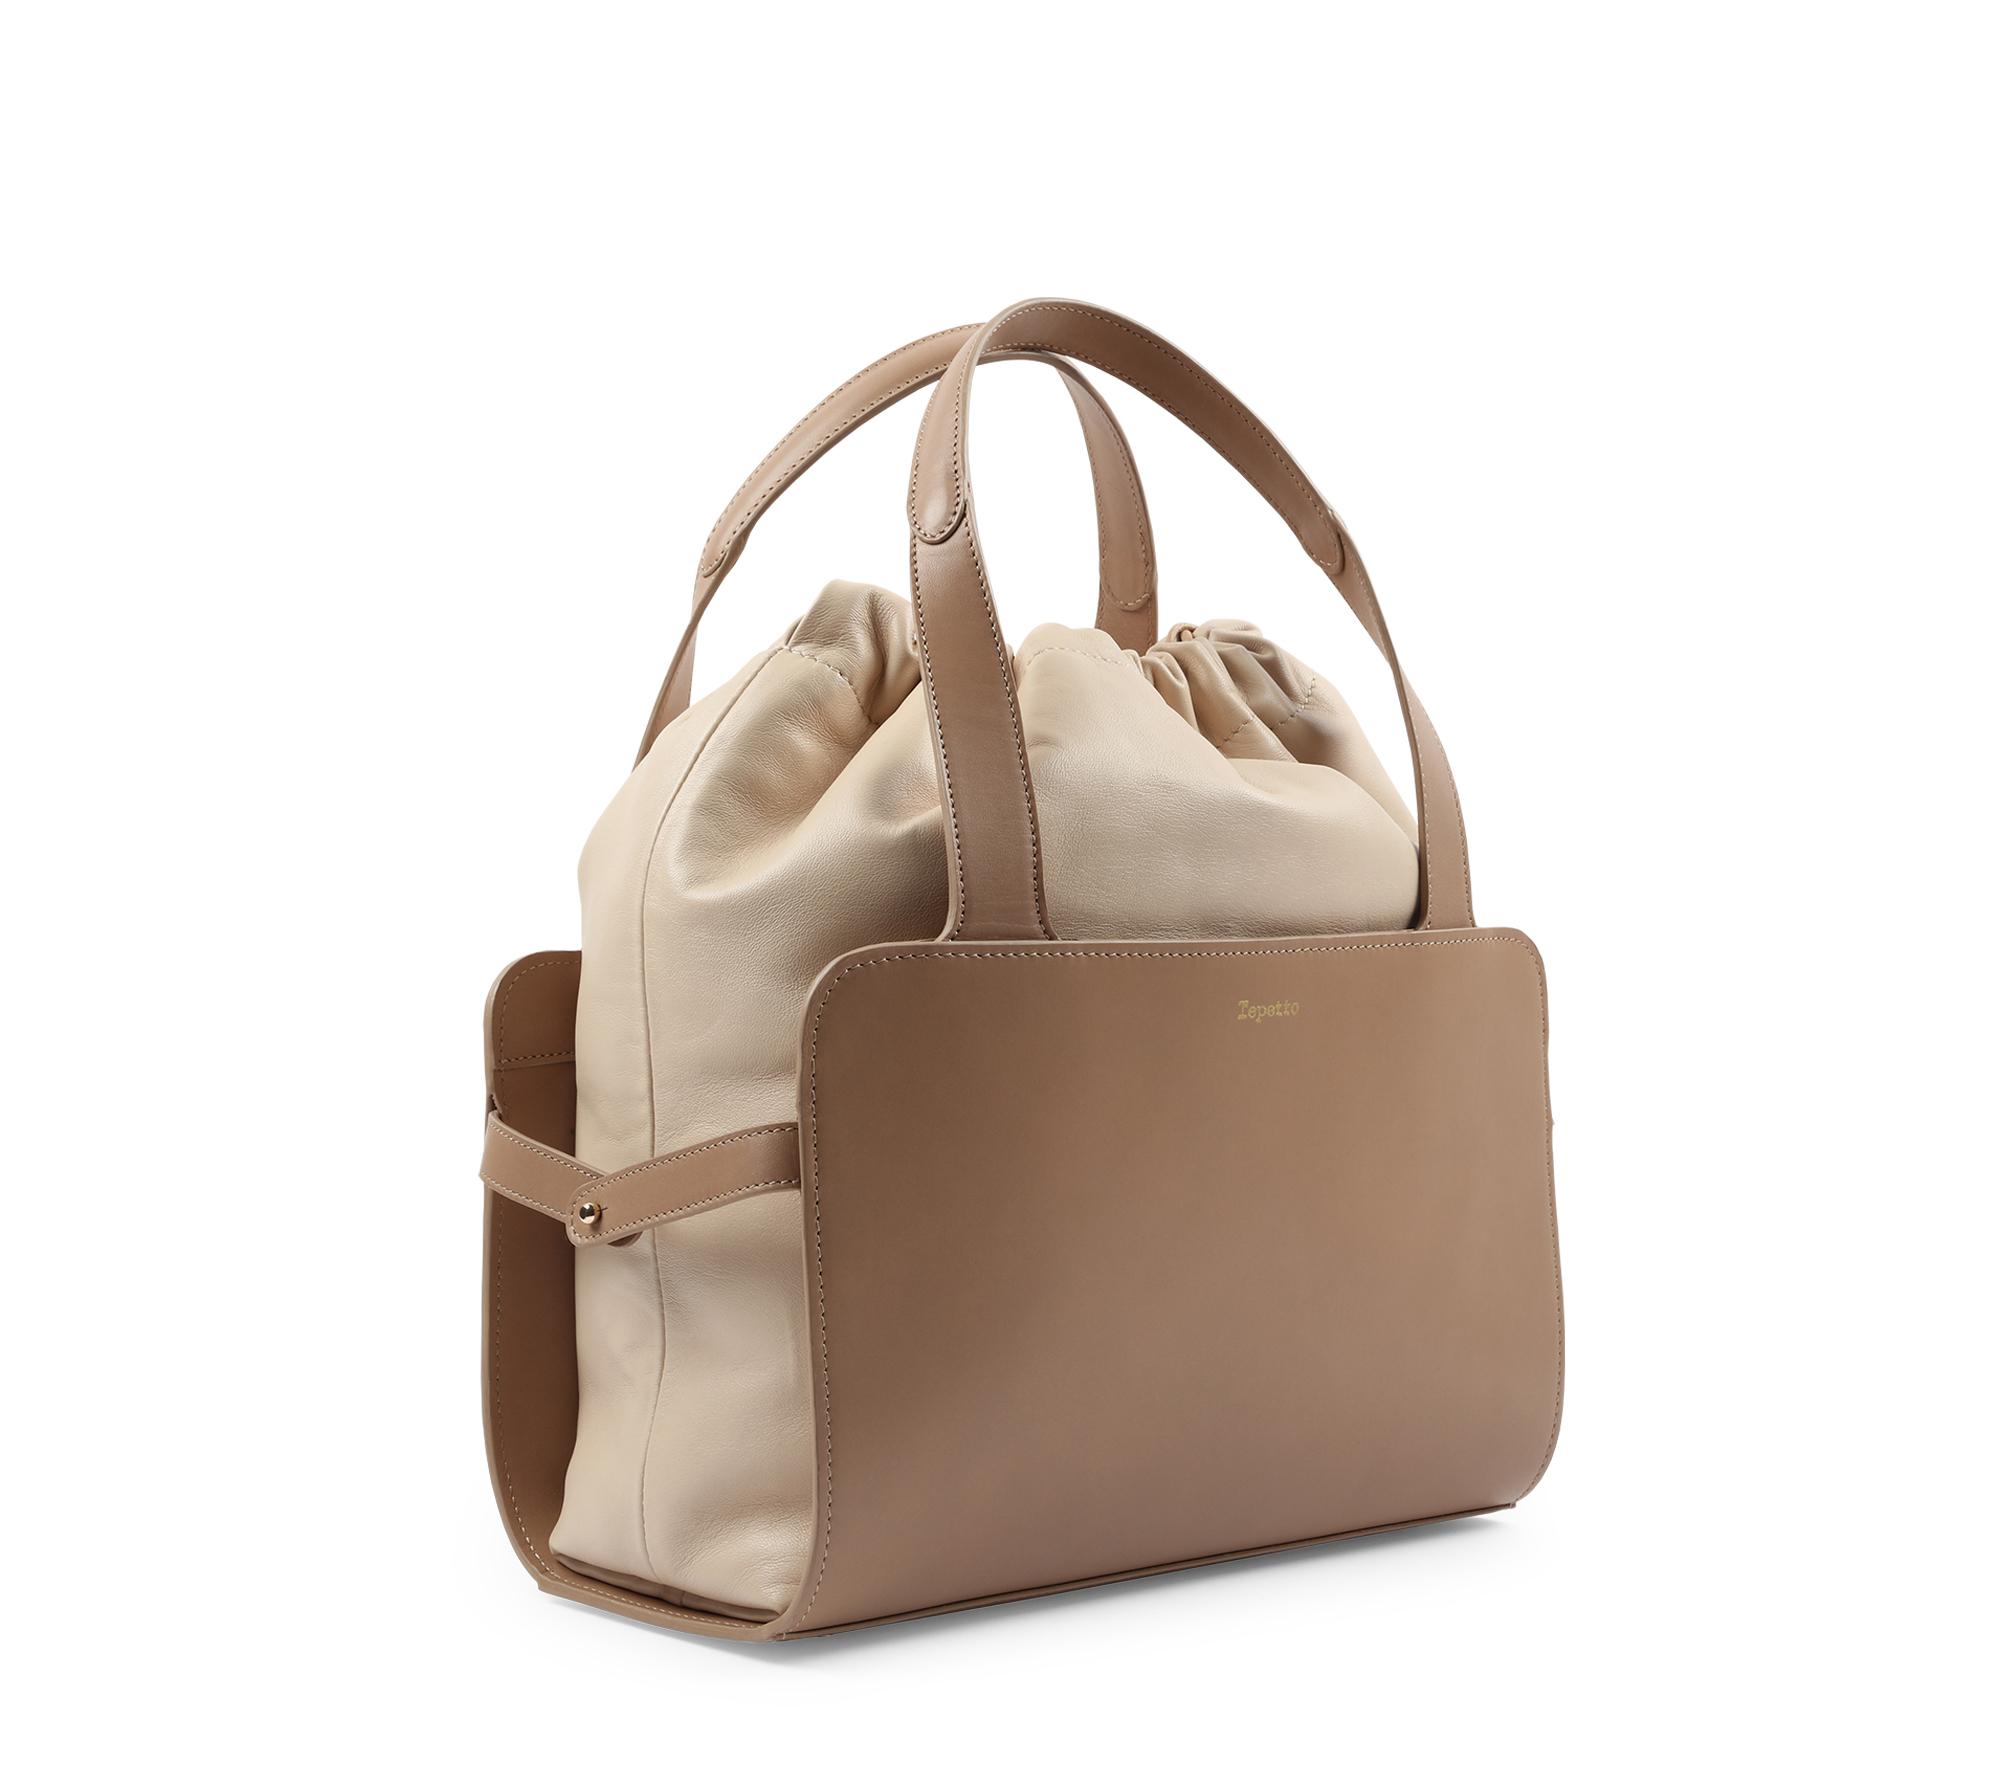 Enveloppé bag Large size